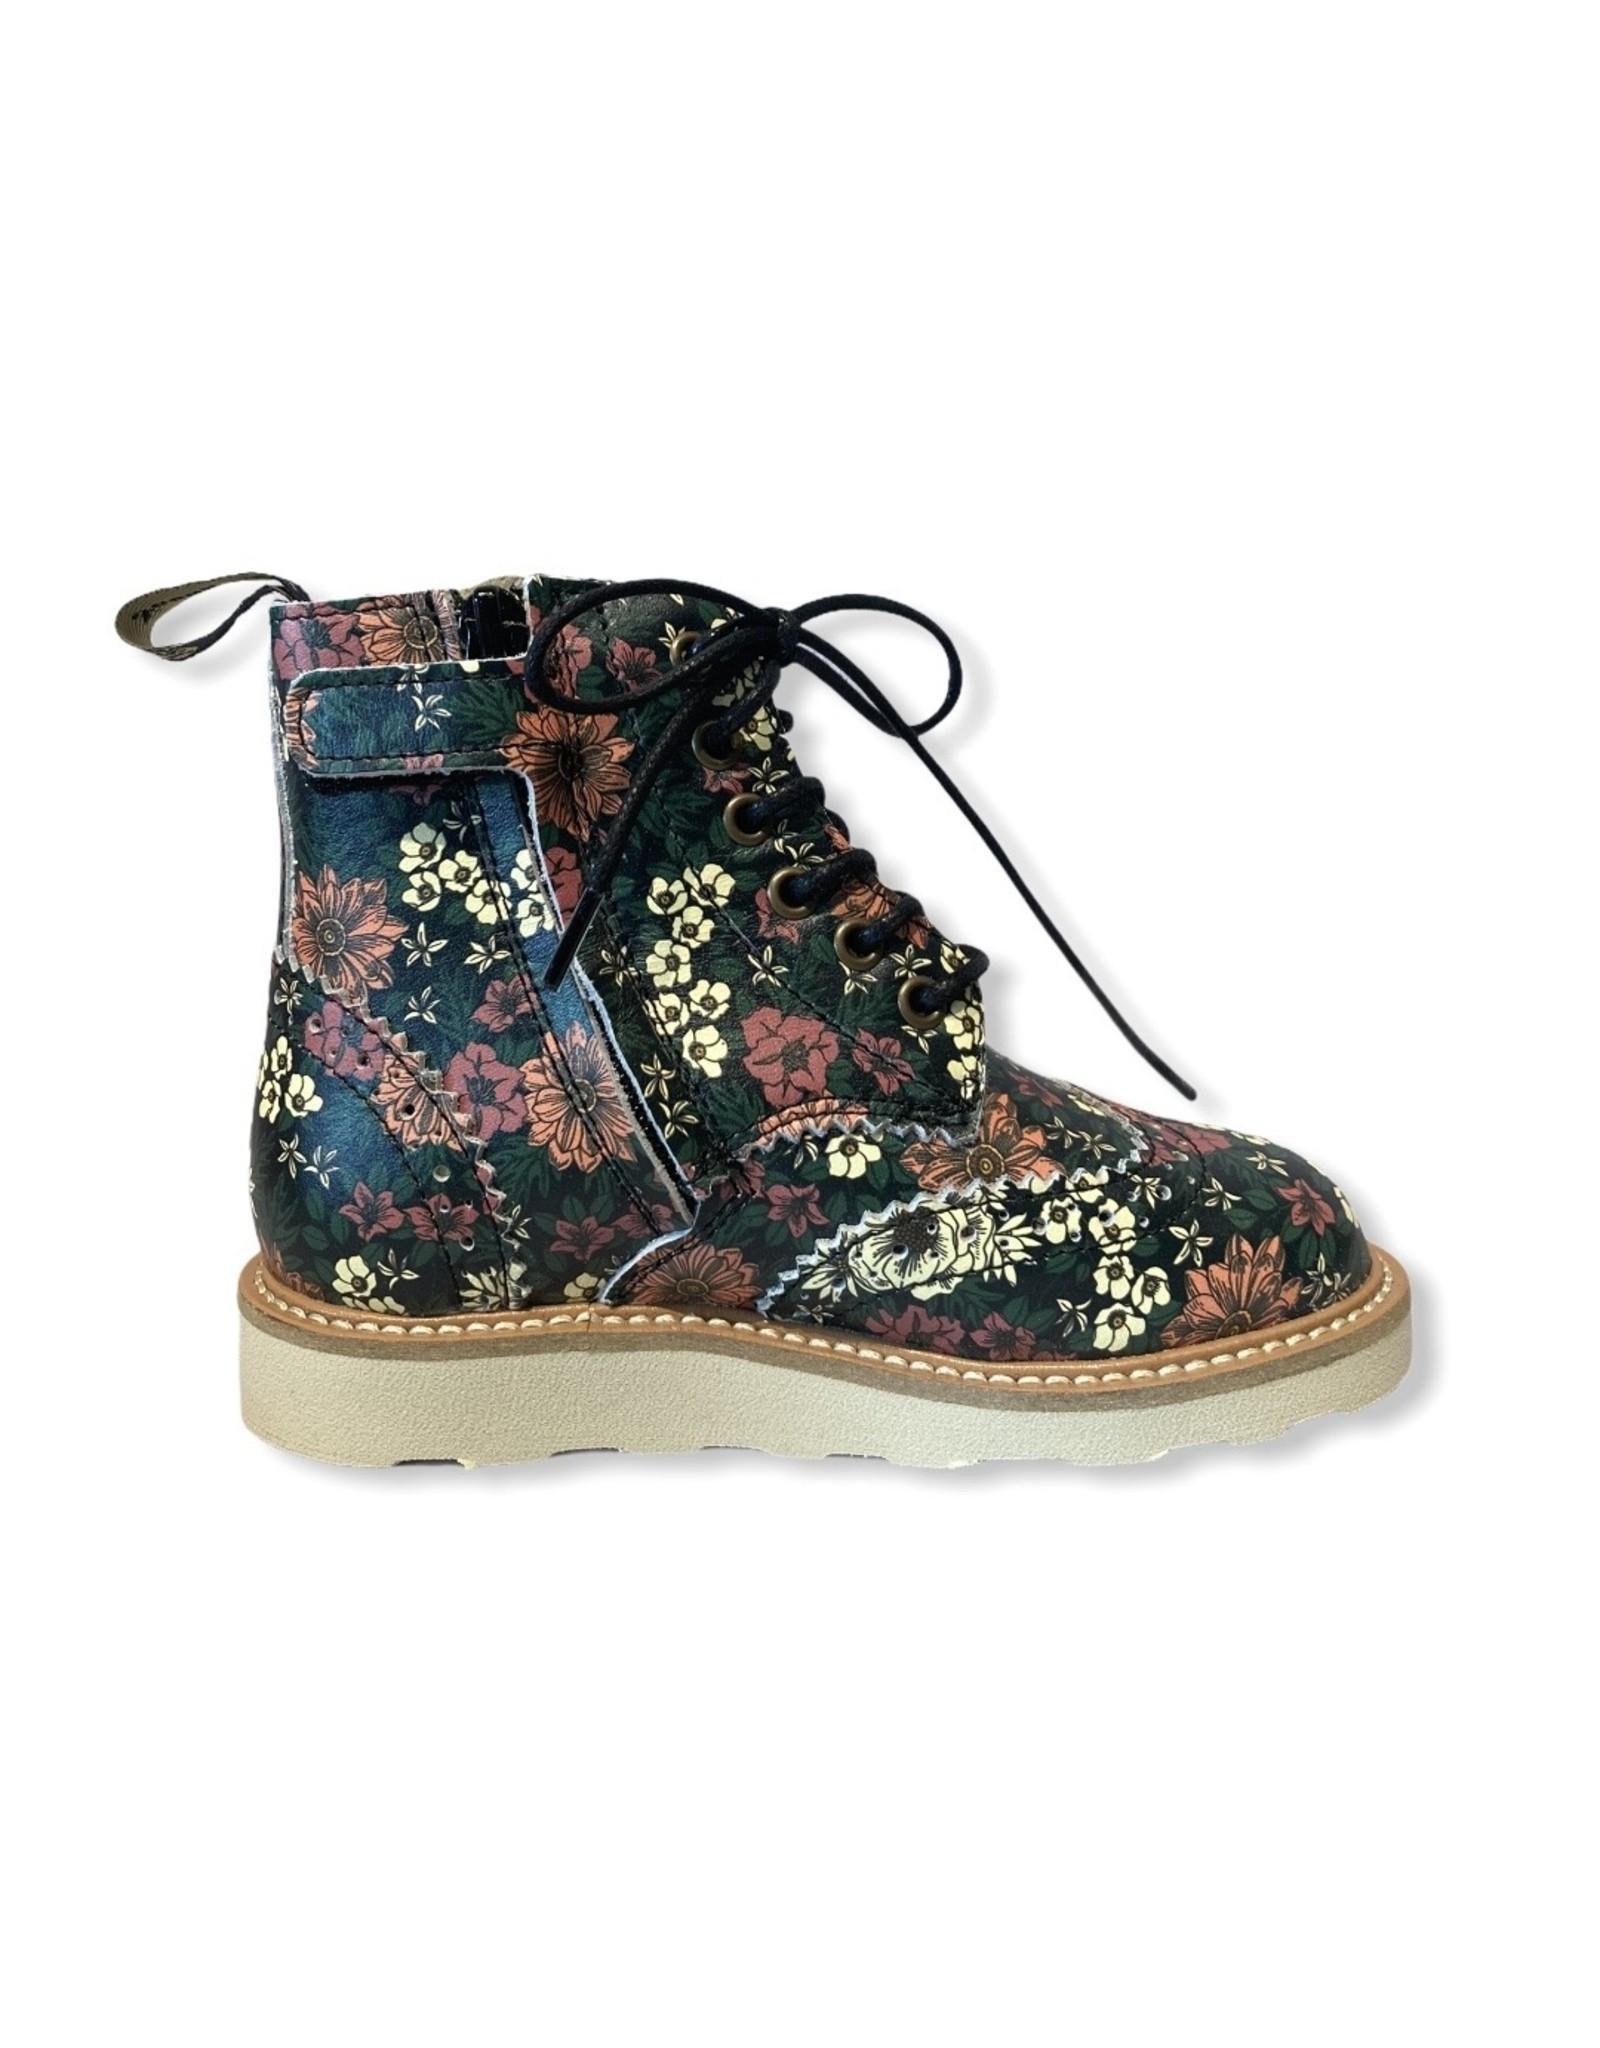 YS FW20 Sydney Brogue boot floral